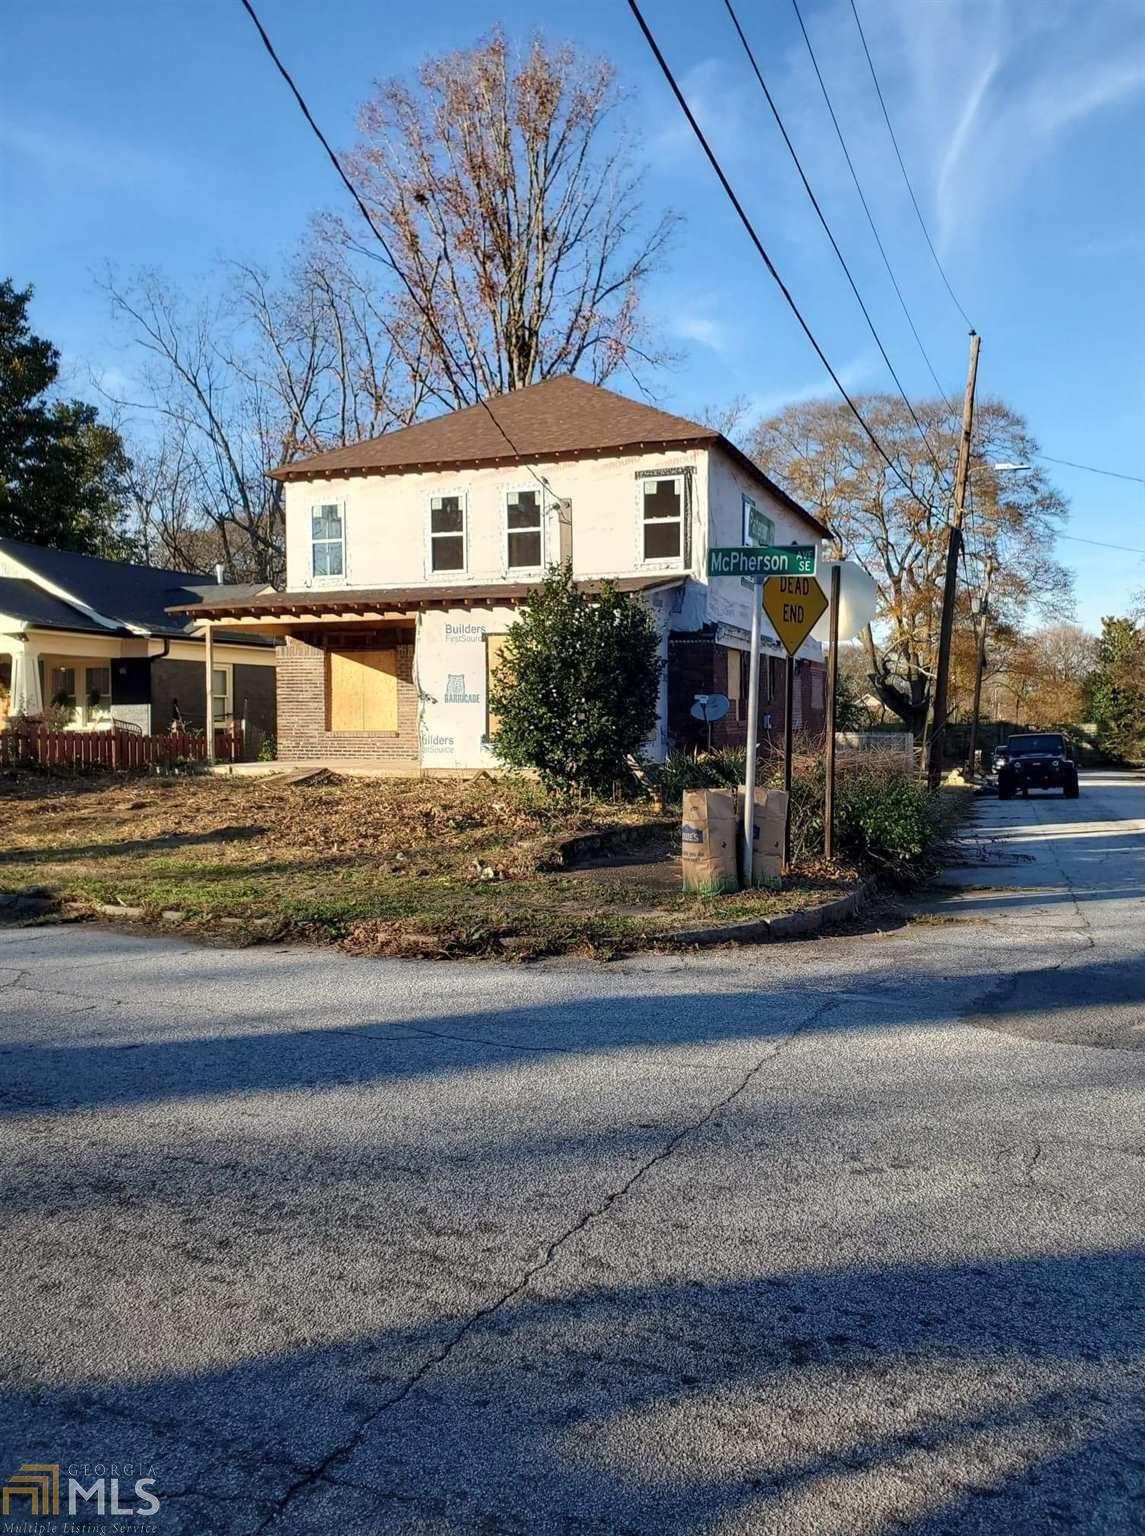 1354 Mcpherson Ave, Atlanta, GA 30316 - MLS#: 8914237